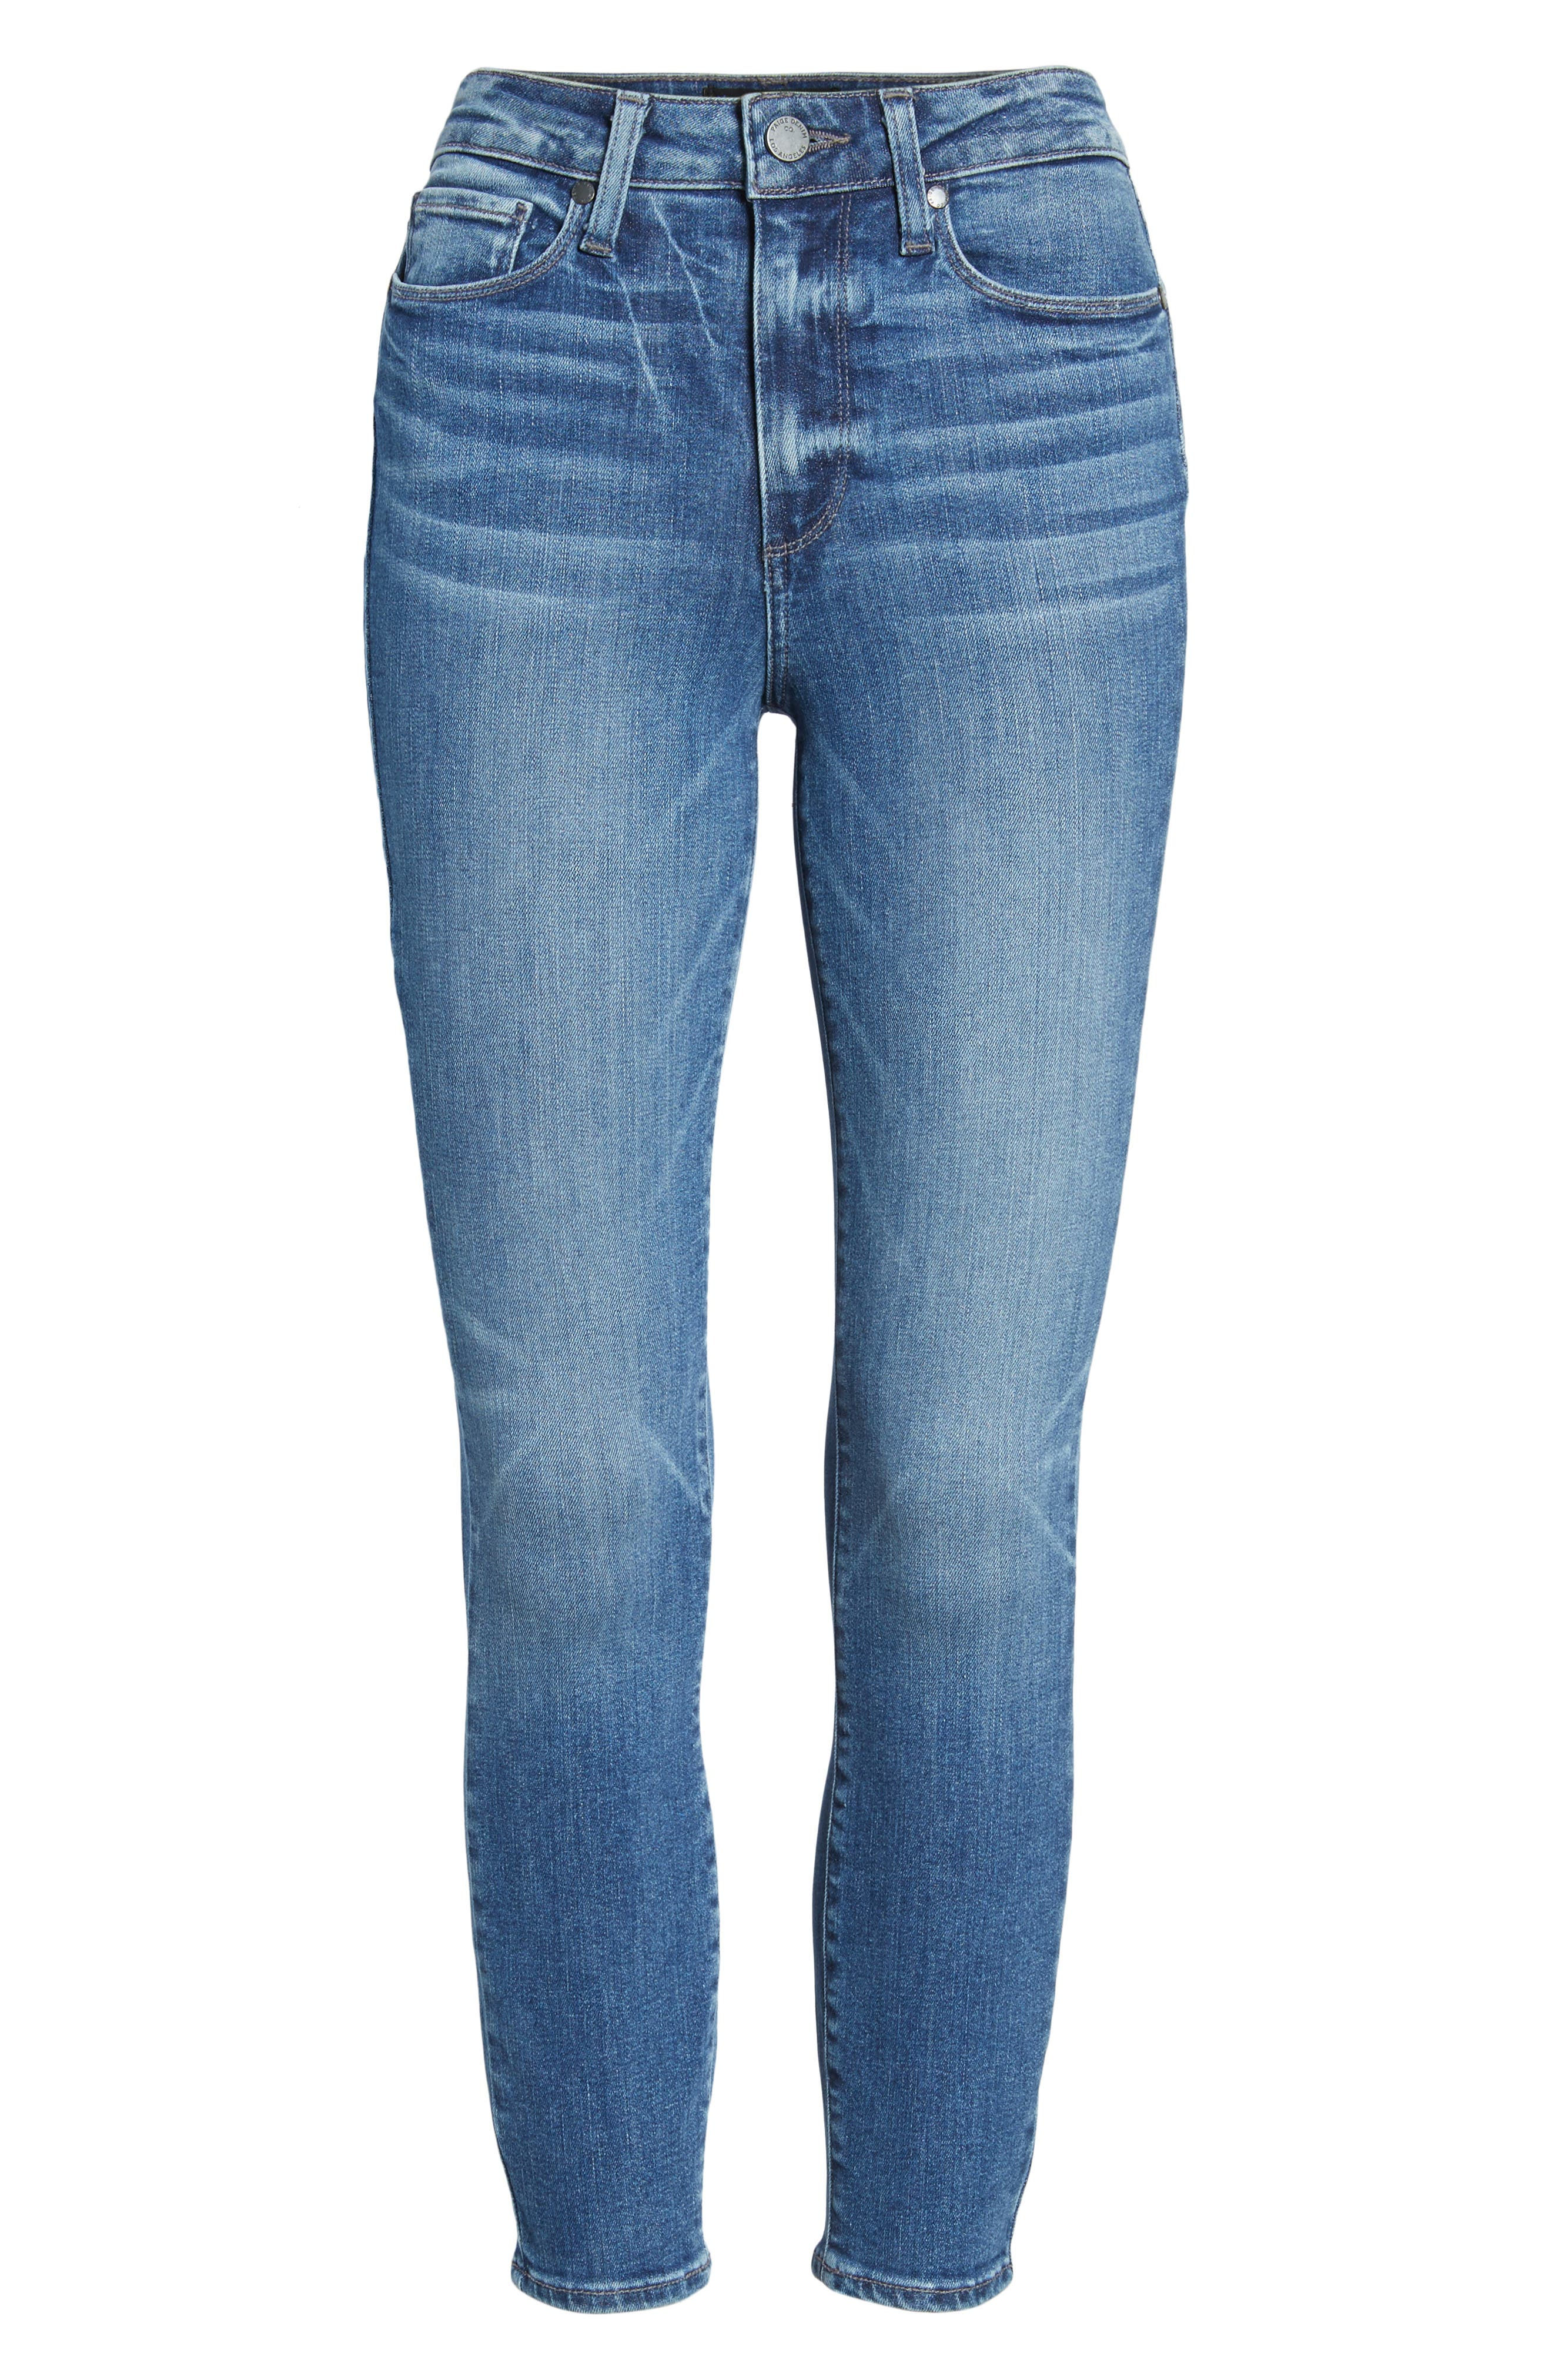 Hoxton High Waist Ankle Skinny Jeans,                             Alternate thumbnail 7, color,                             400